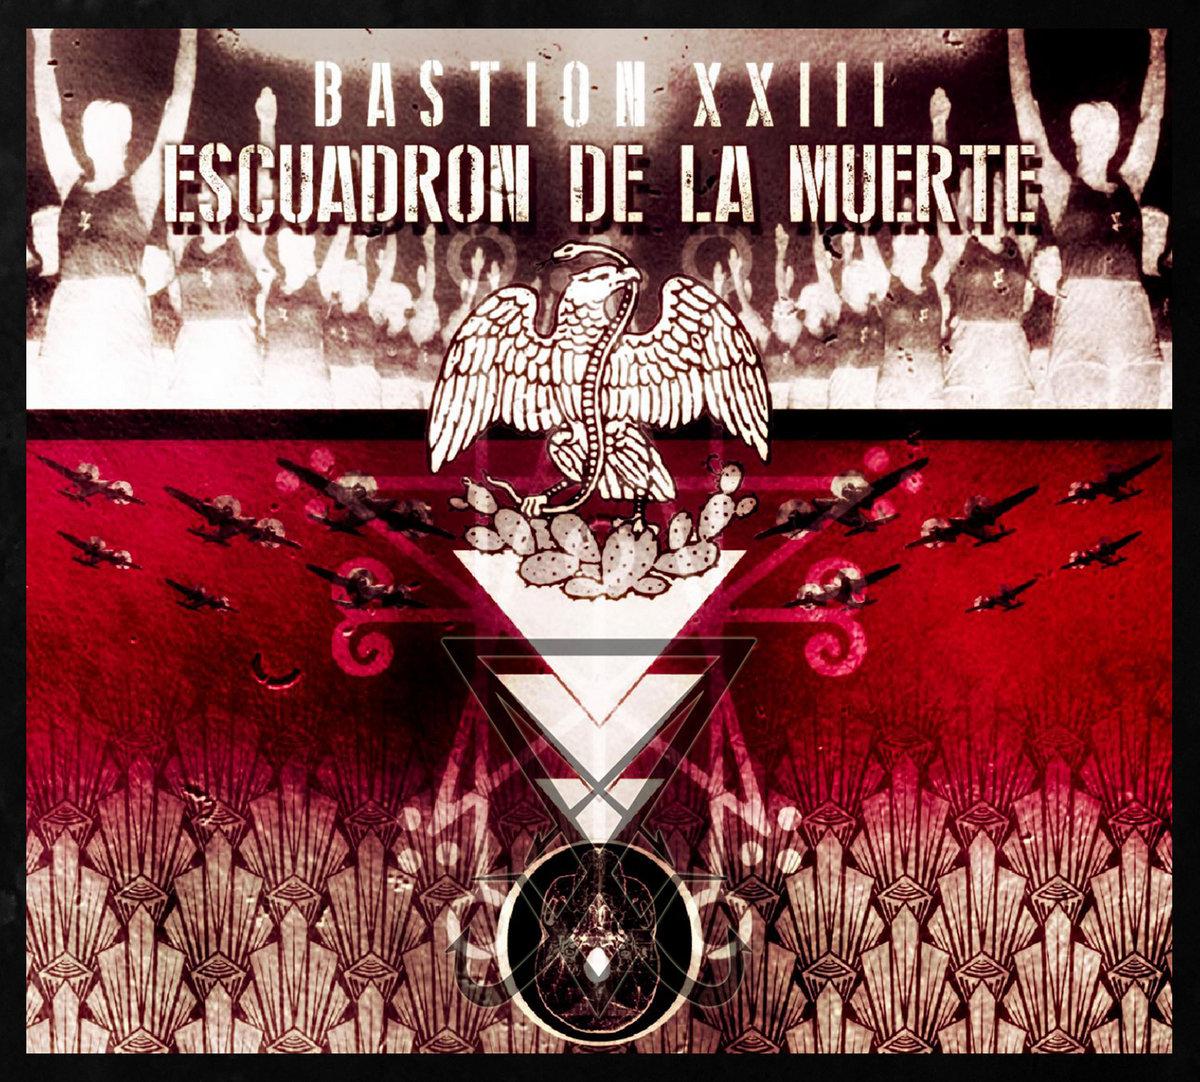 Escuadron De La Muerte – Bastion XXIII (2020) [FLAC]